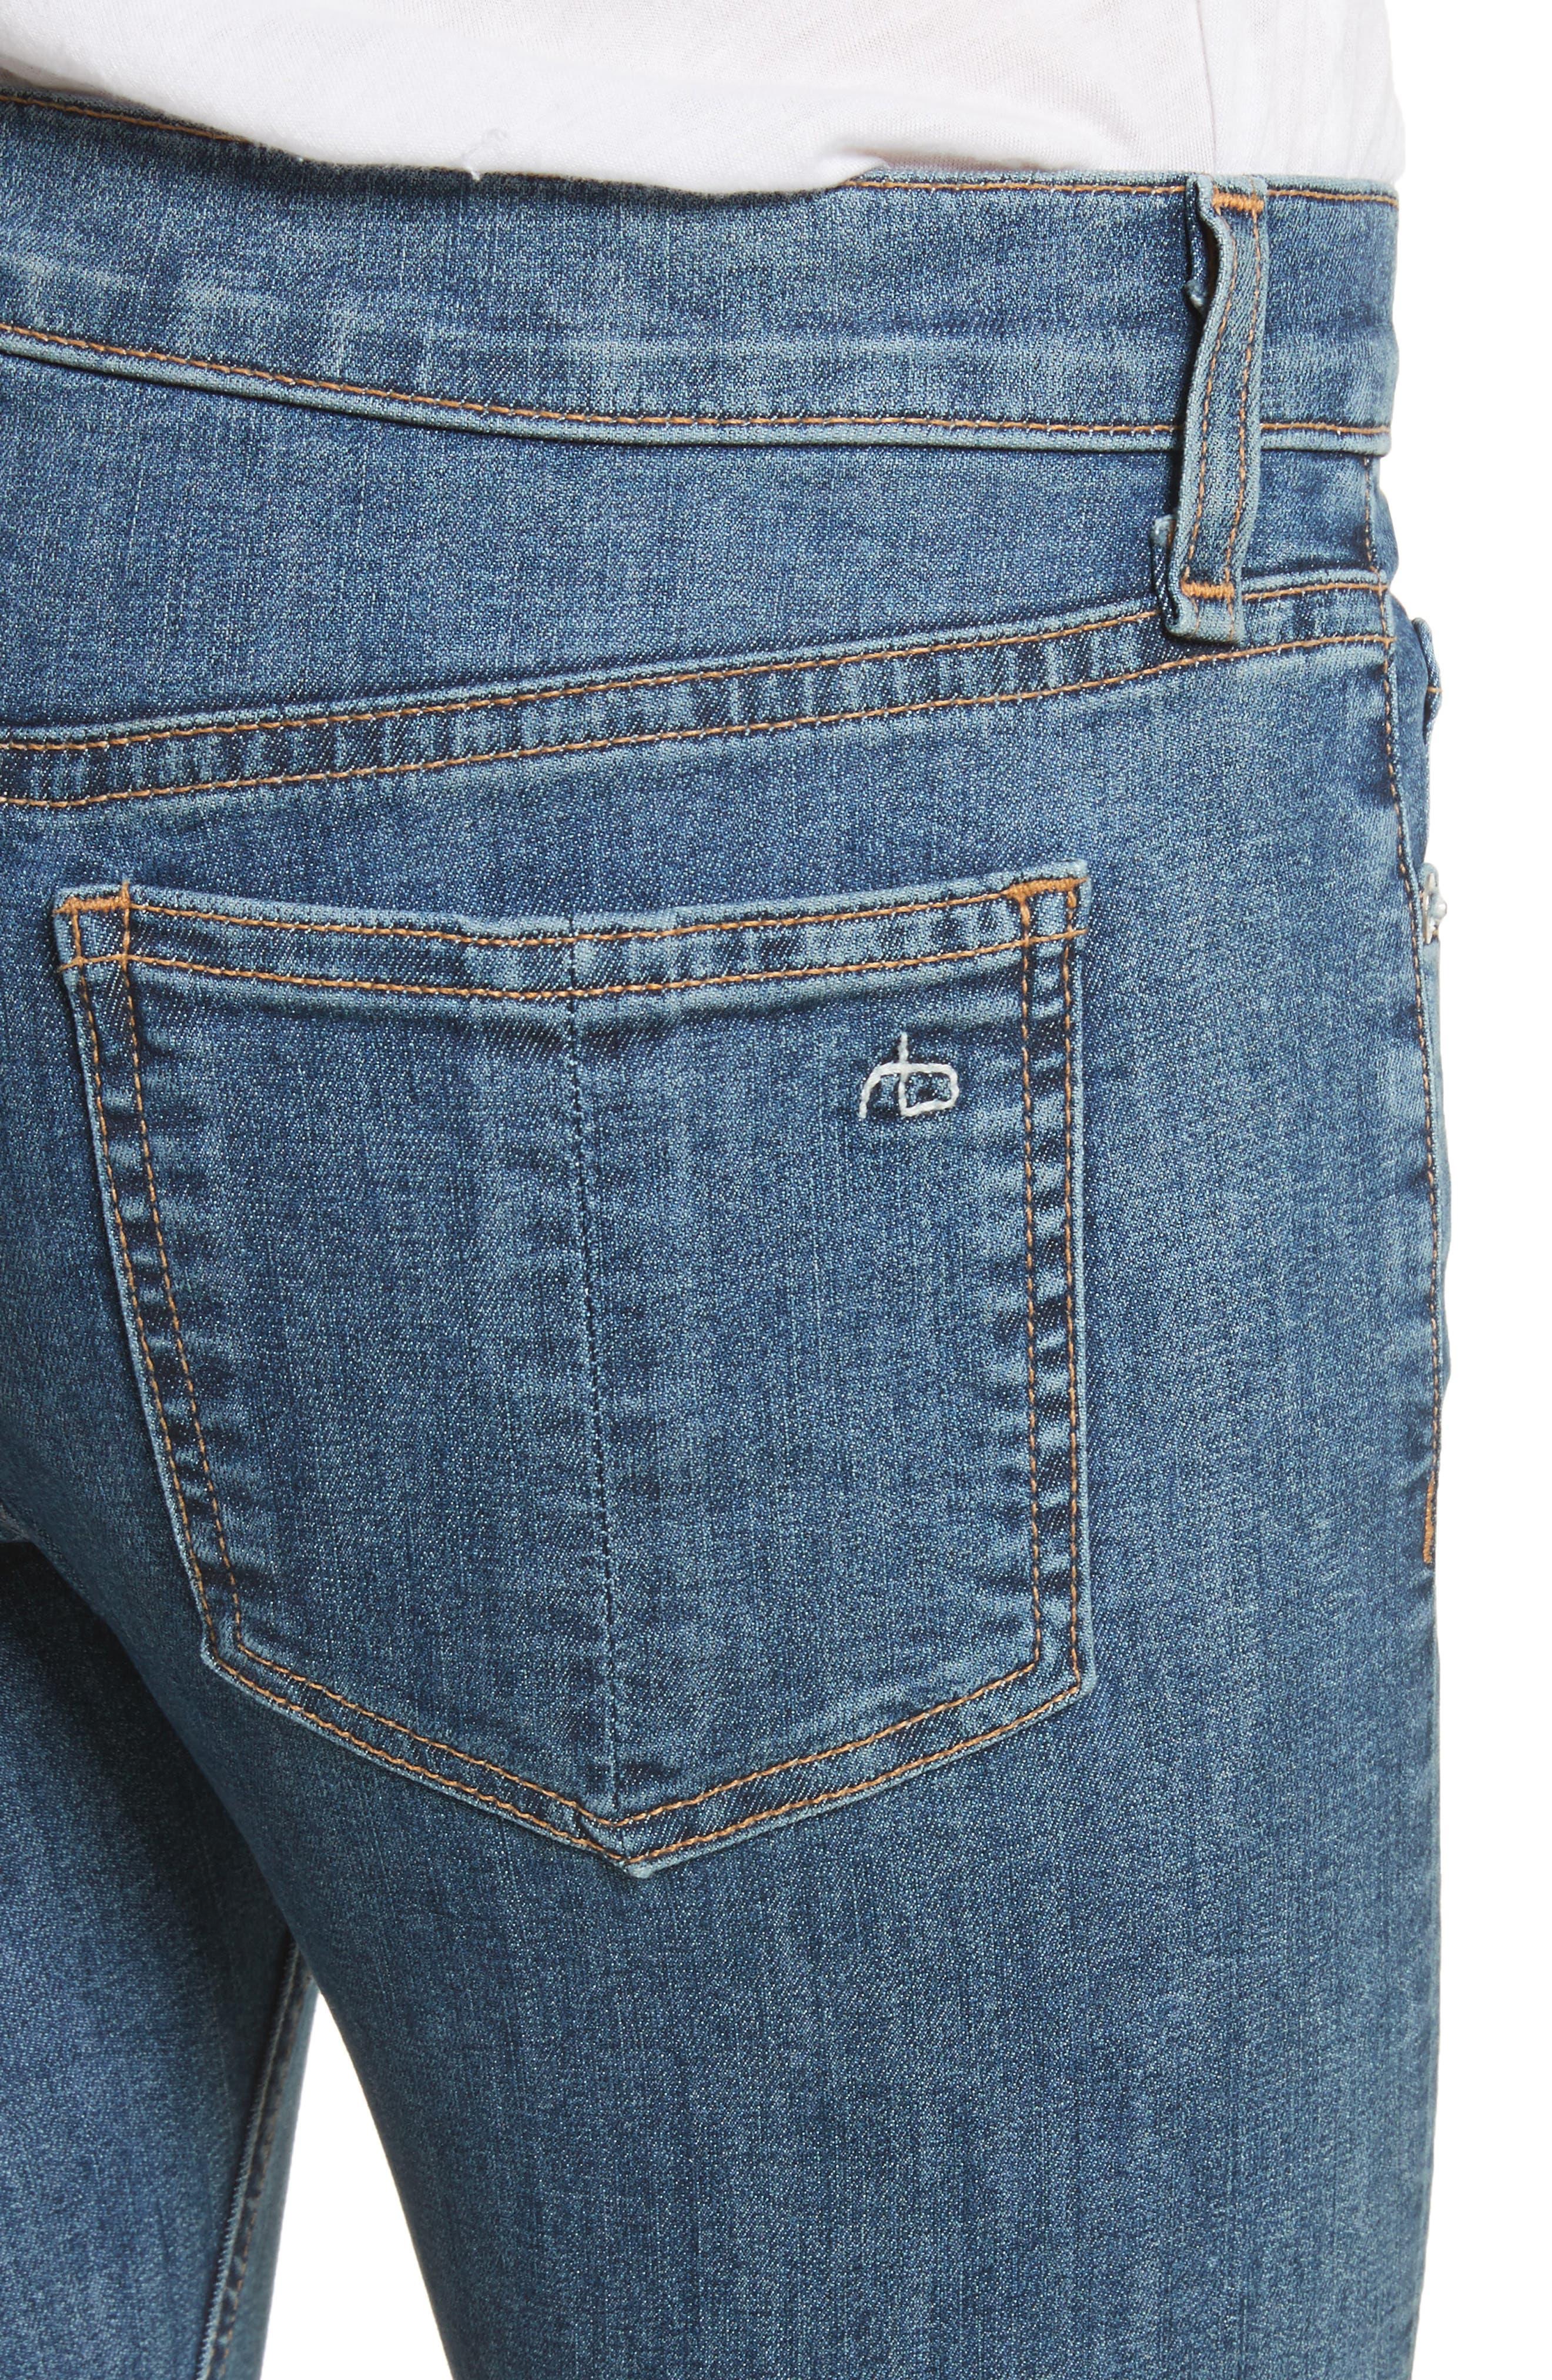 Skinny Jeans,                             Alternate thumbnail 4, color,                             Bloo